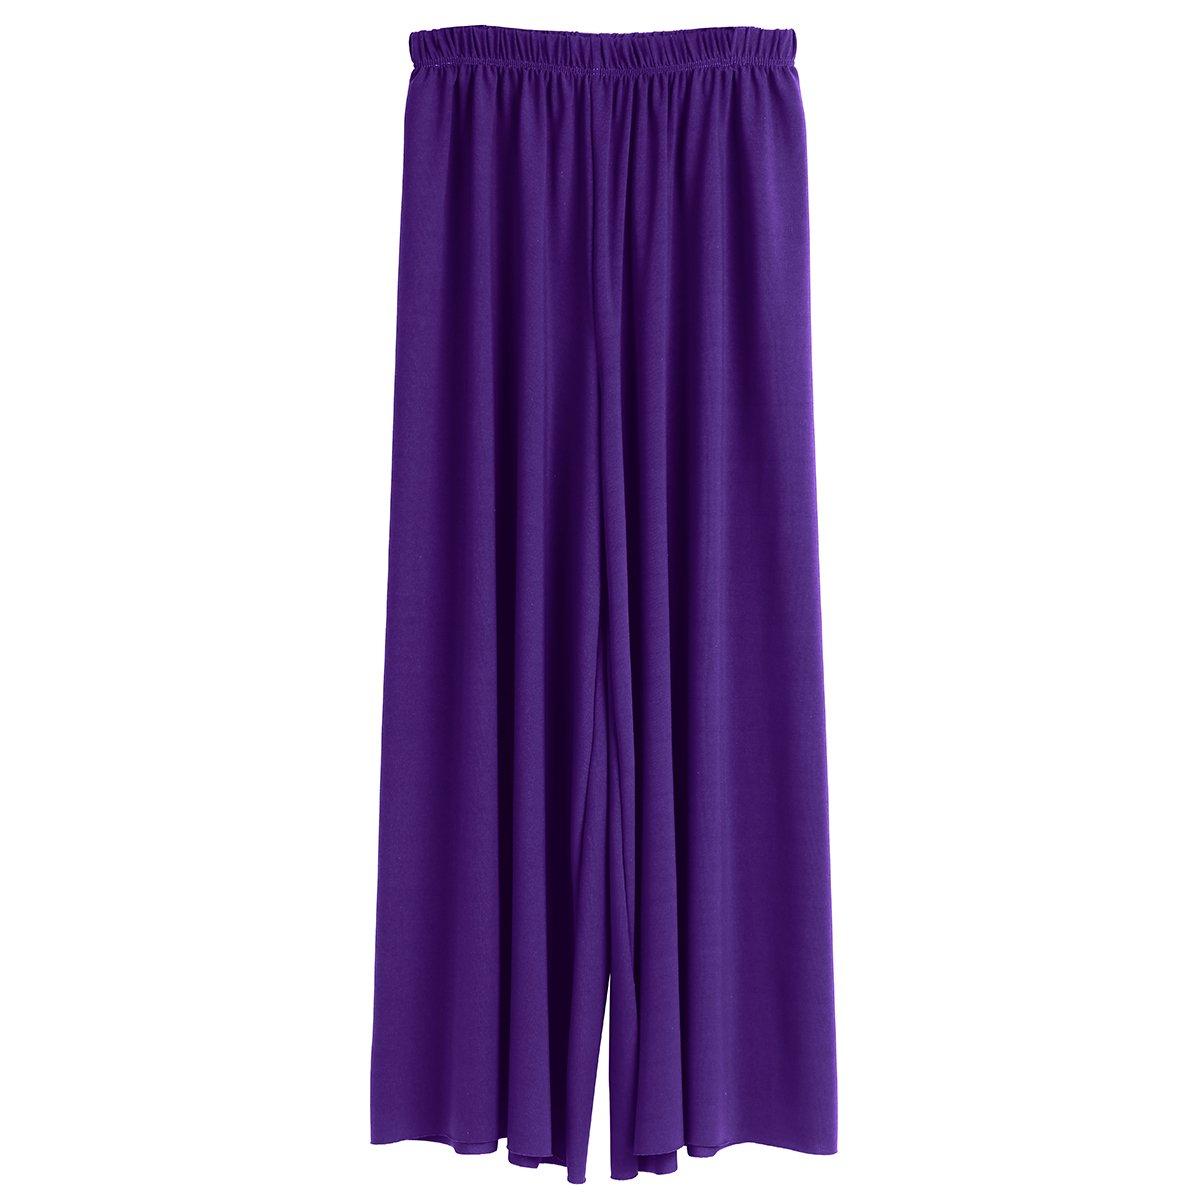 TiaoBug Kids Girls Loose Wide Leg Palazzo Pants Straight Pants Casual Trousers